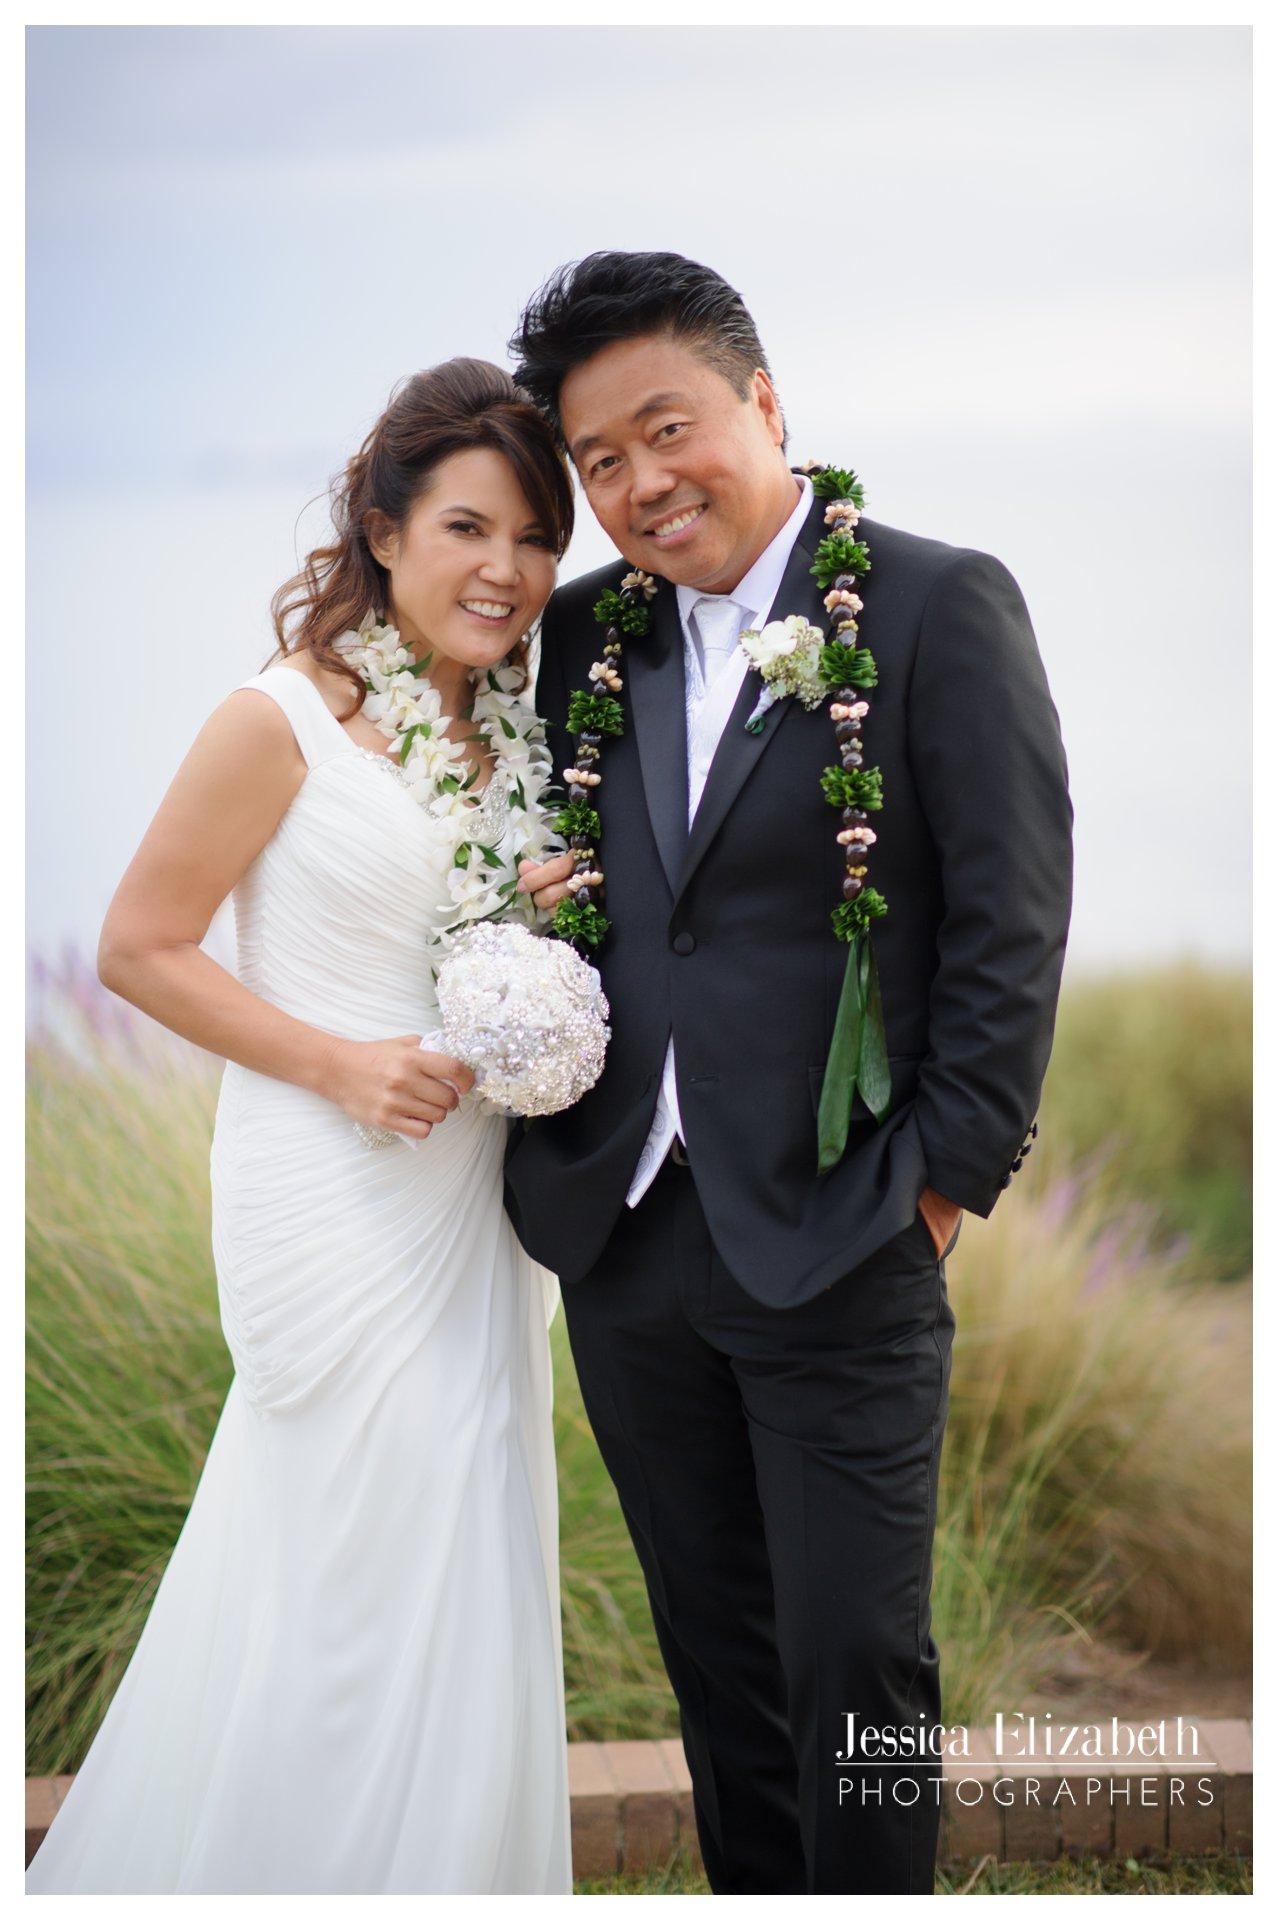 28-Terranea-Palos-Verdes-Wedding-Photography-by-Jessica-Elizabeth-w.jpg